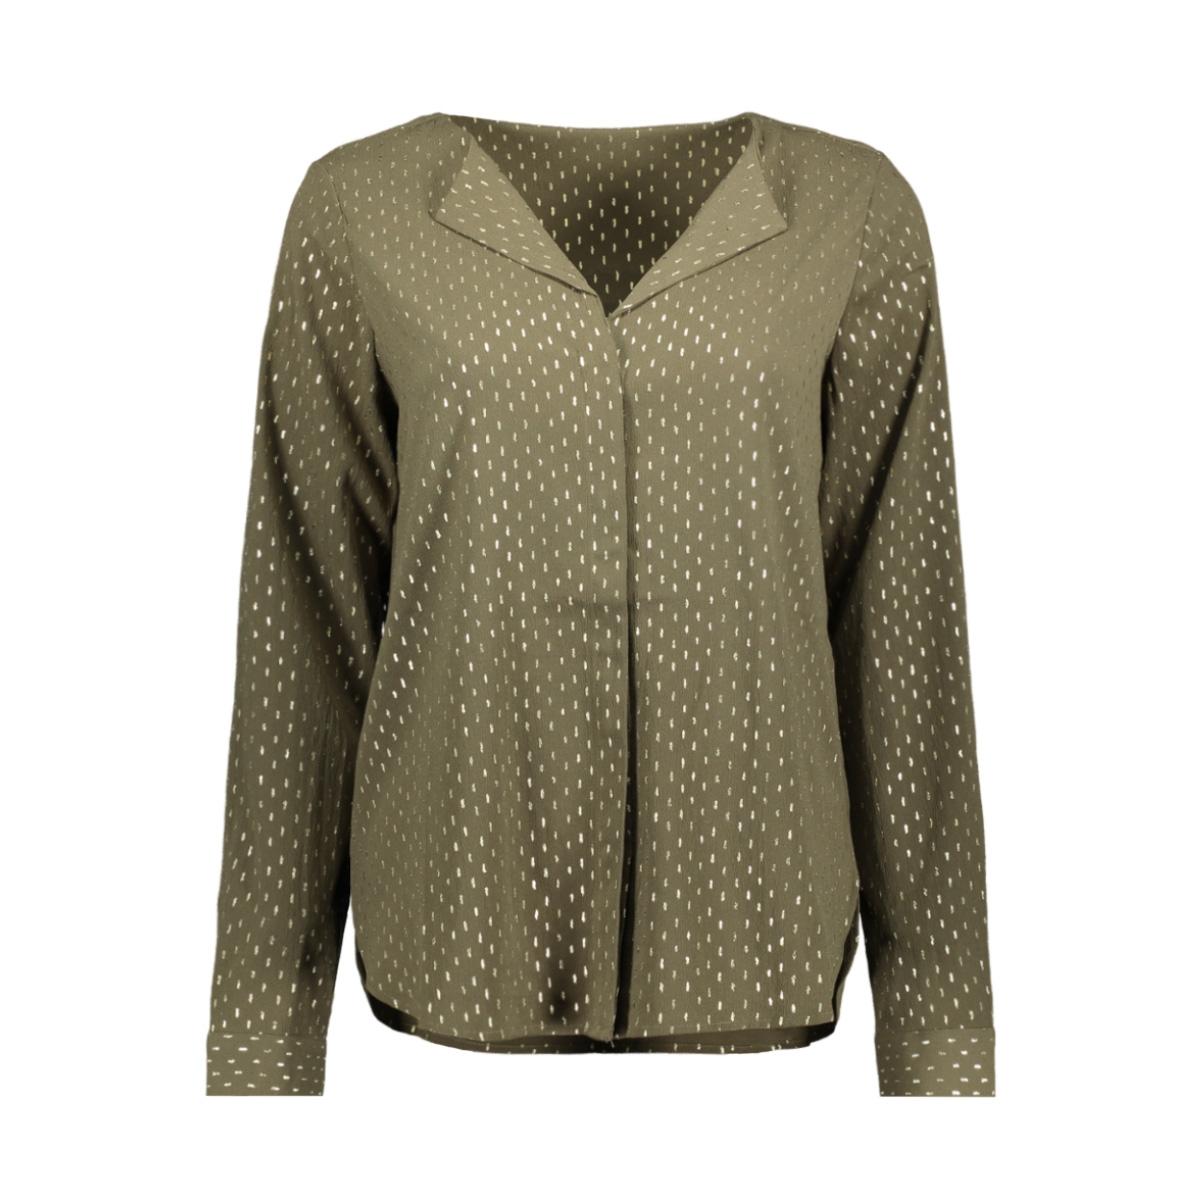 vmgrace l/s top aop 10222941 vero moda blouse ivy green /foil gold